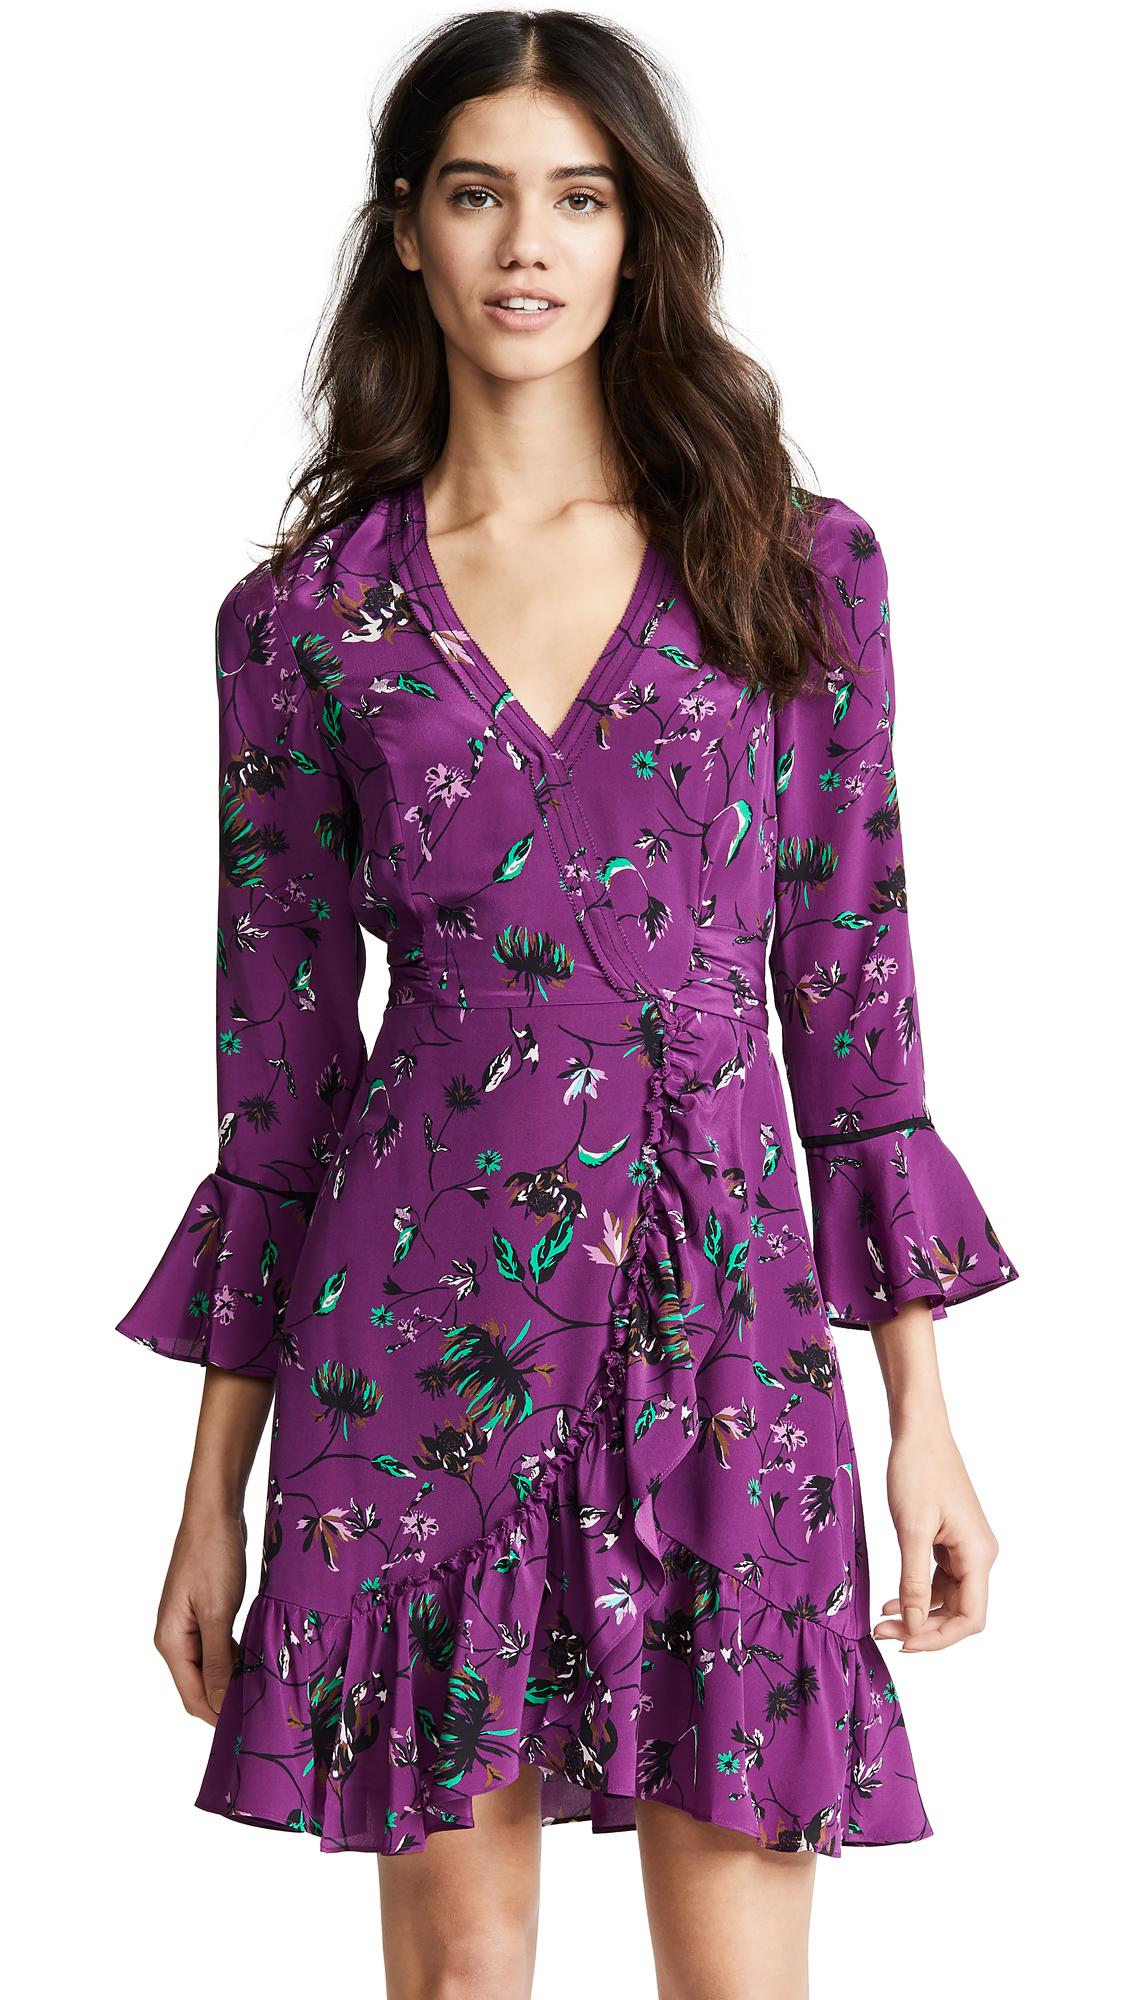 TANYA TAYLOR Nomi Vines Print Faux Wrap Silk Dress in Purple